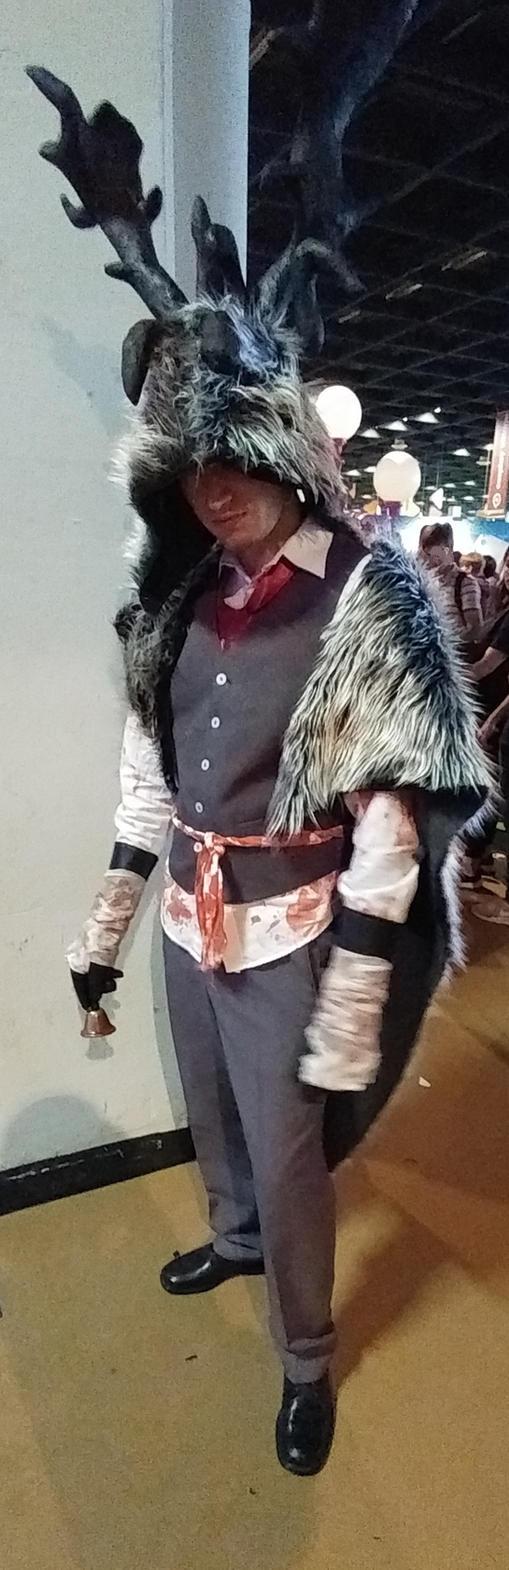 Bloodborne Brador Cosplay by ColdSeduction